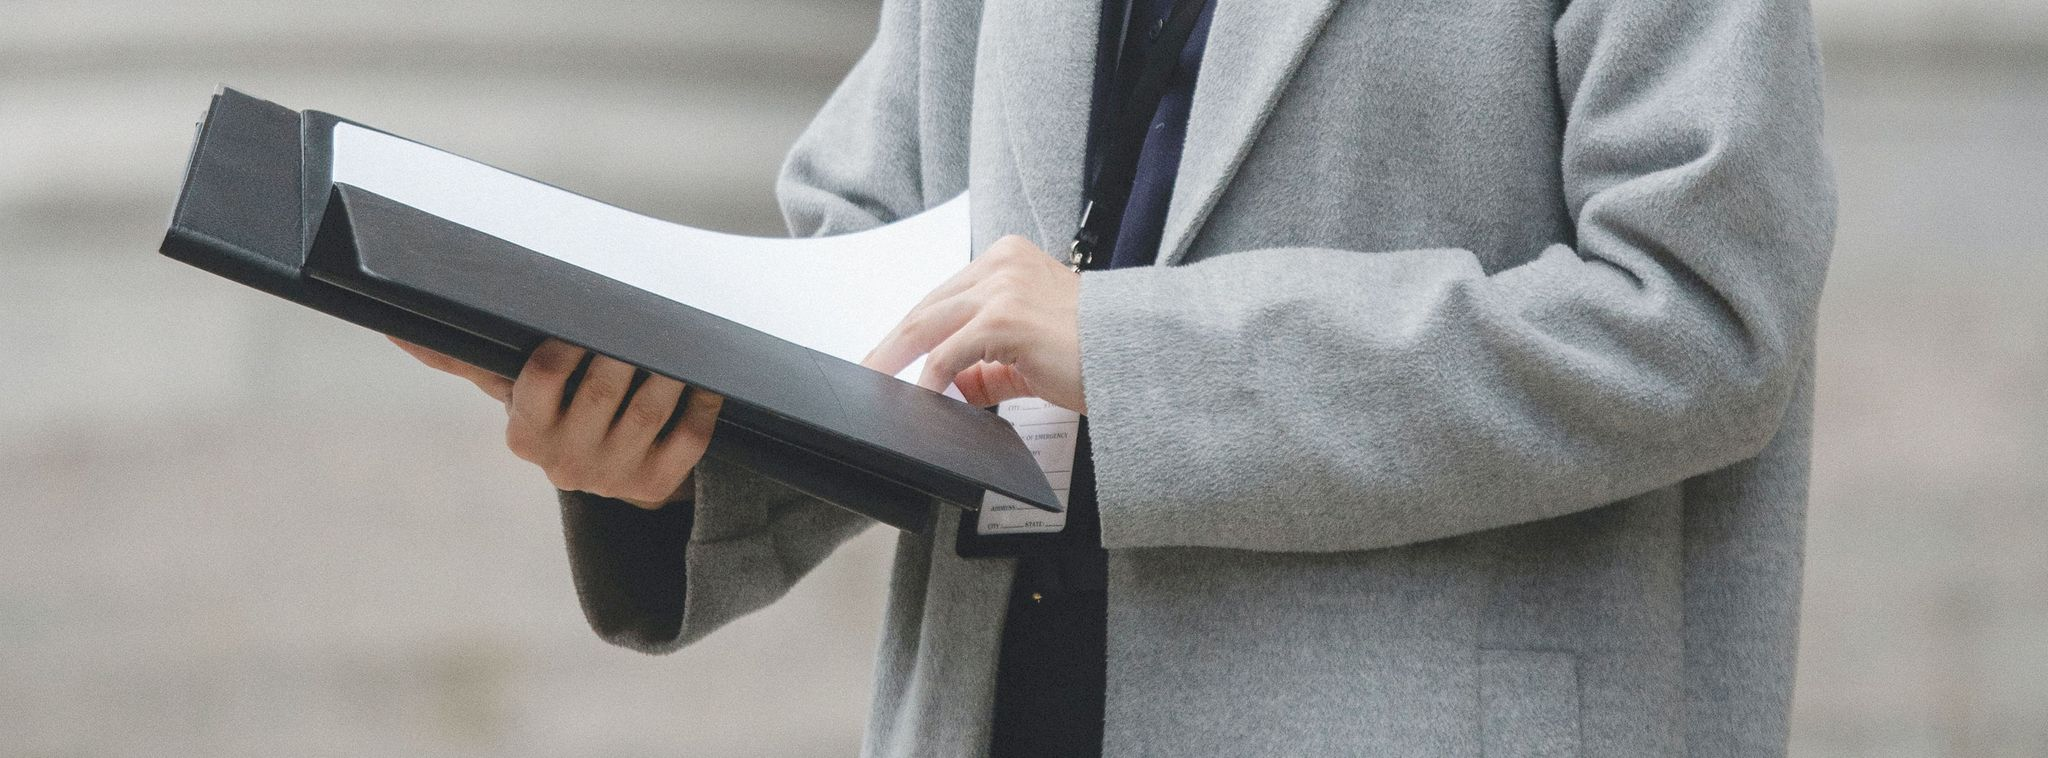 Anfechtung des Arbeitsvertrages